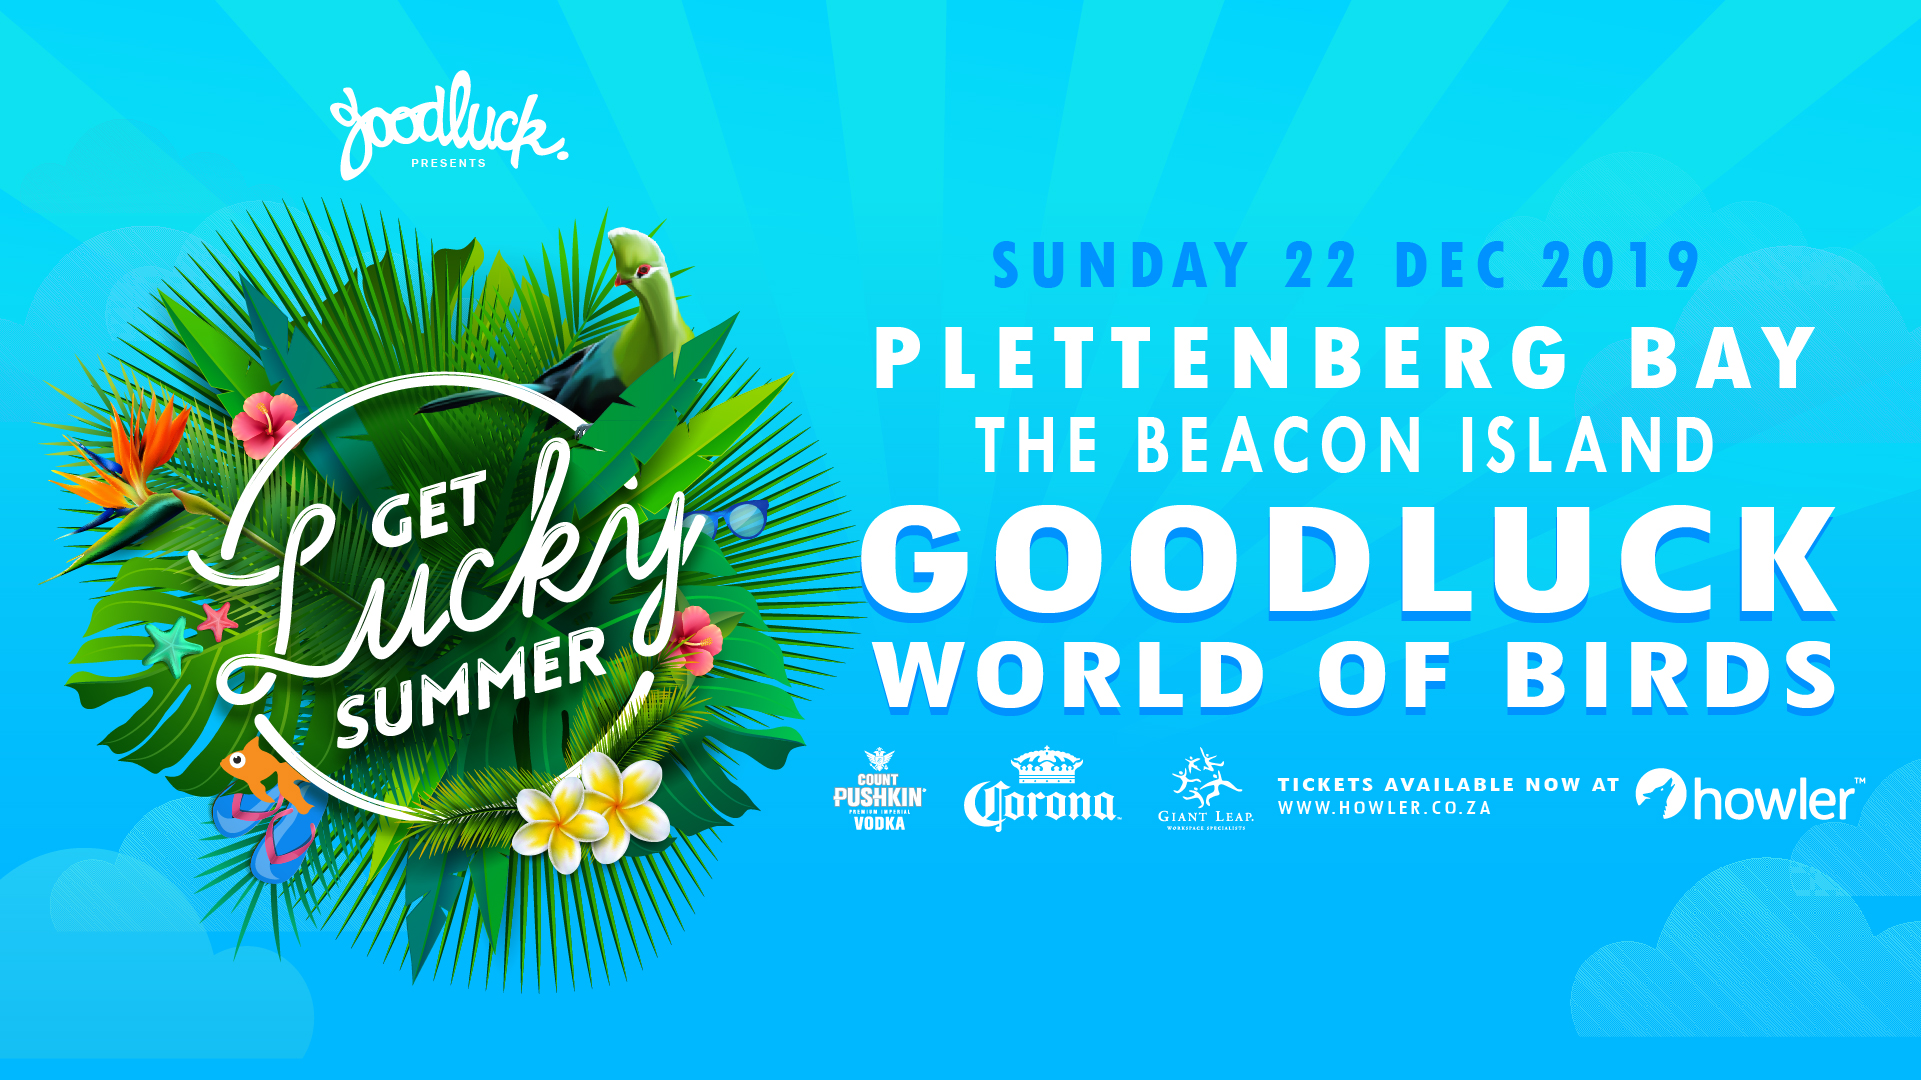 Get Lucky Summer in Plett Goodluck and World of Birds